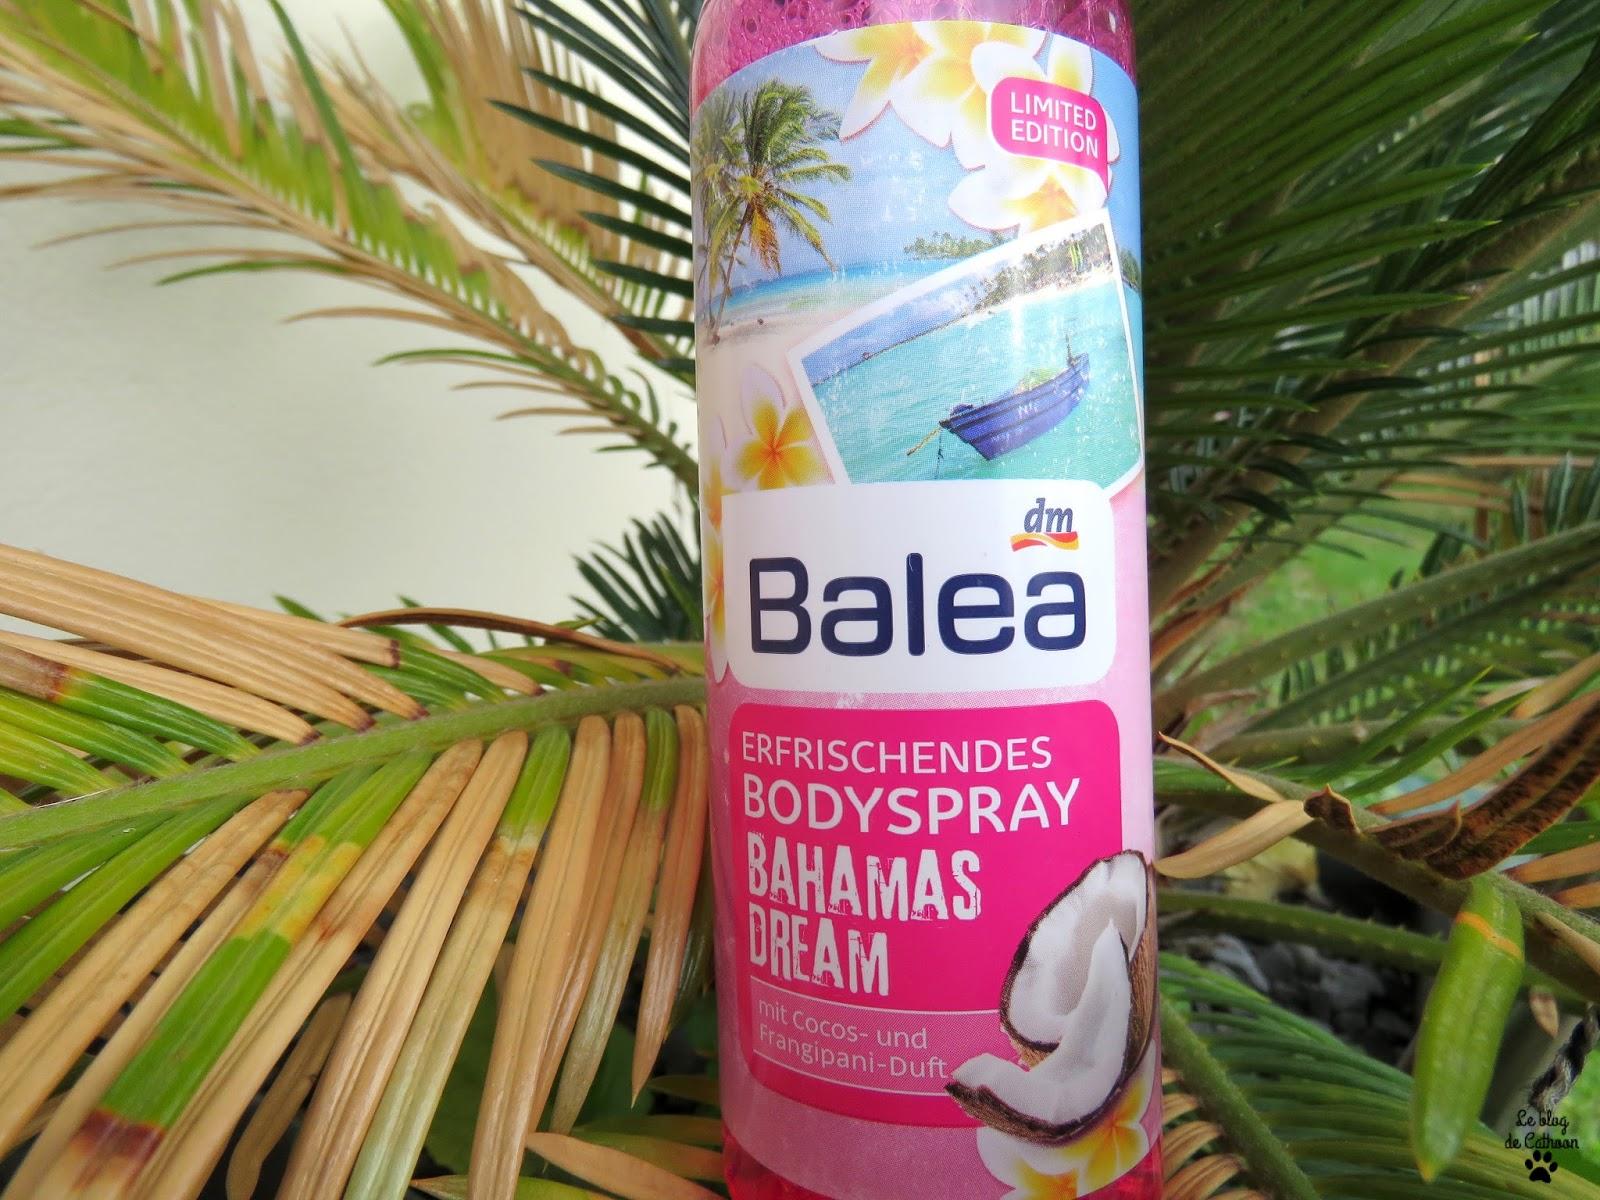 Bahamas Dream - Brume Corporelle - Balea dm